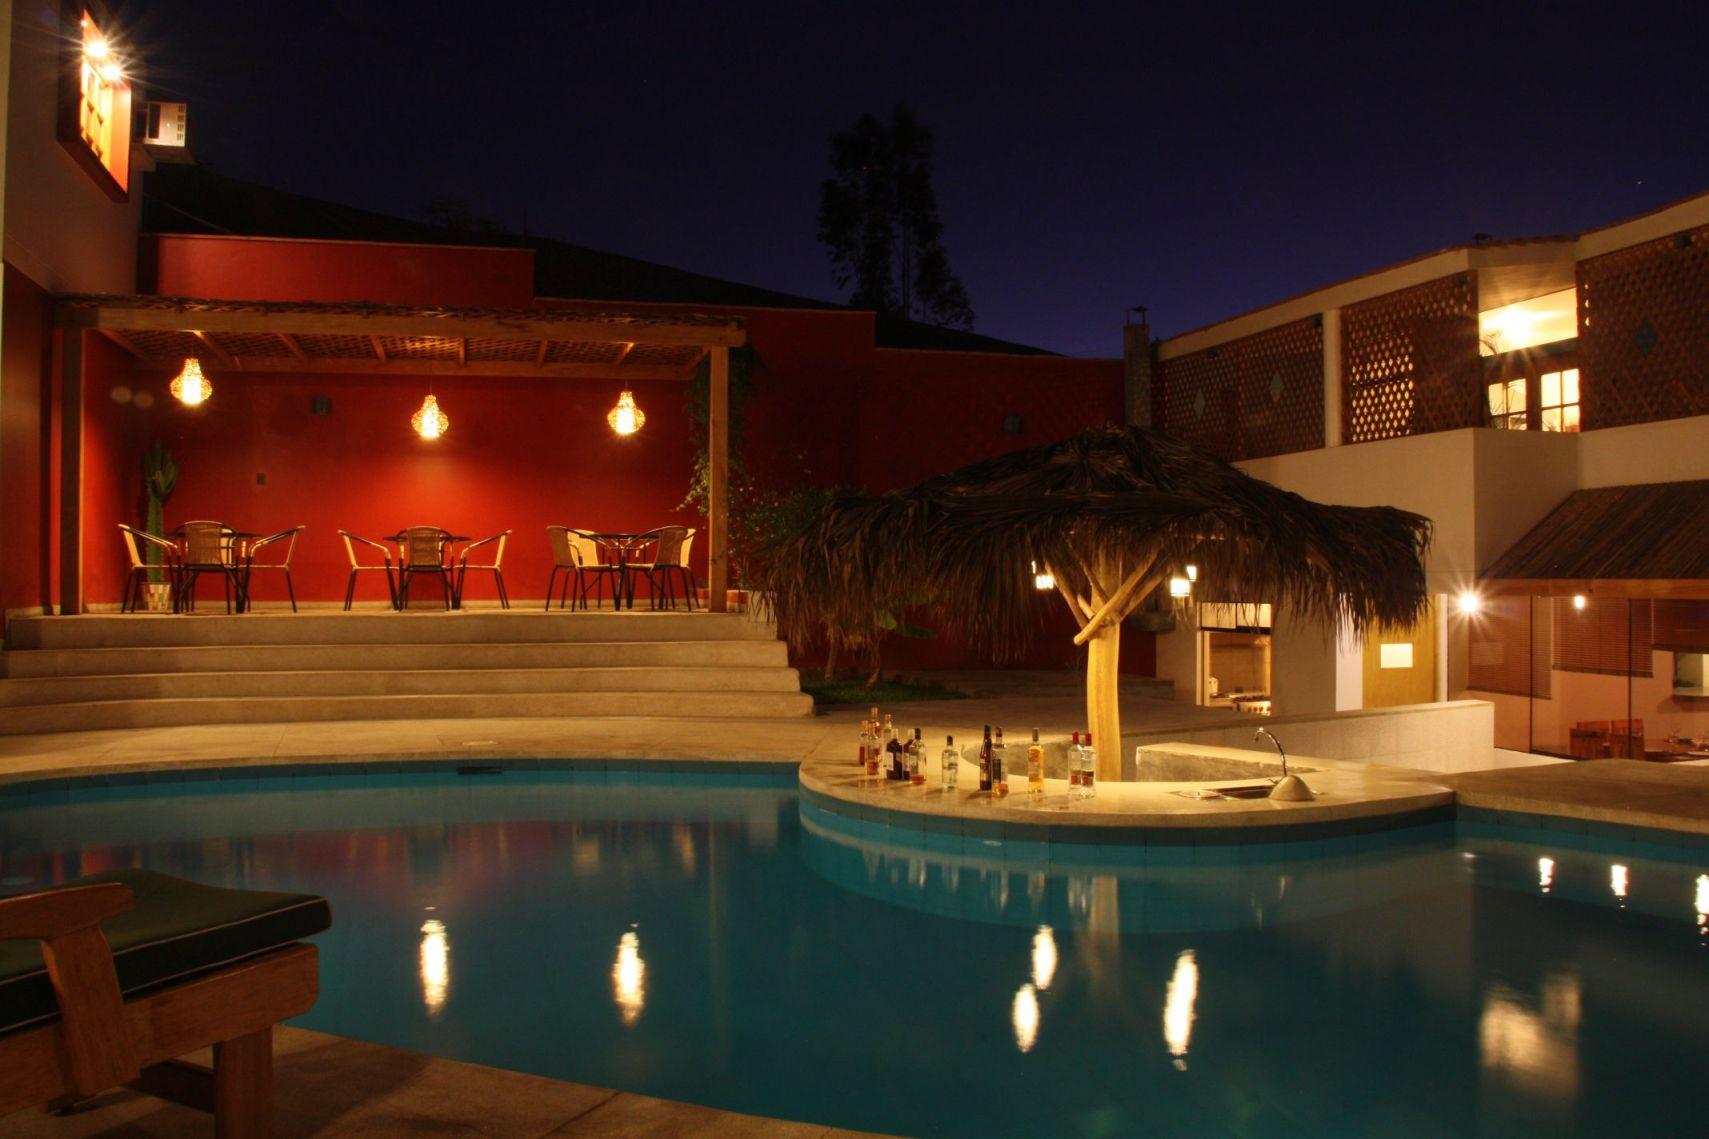 Hotel Villa Jazmín, Ica, Perú Photo credit, Mozes Martens